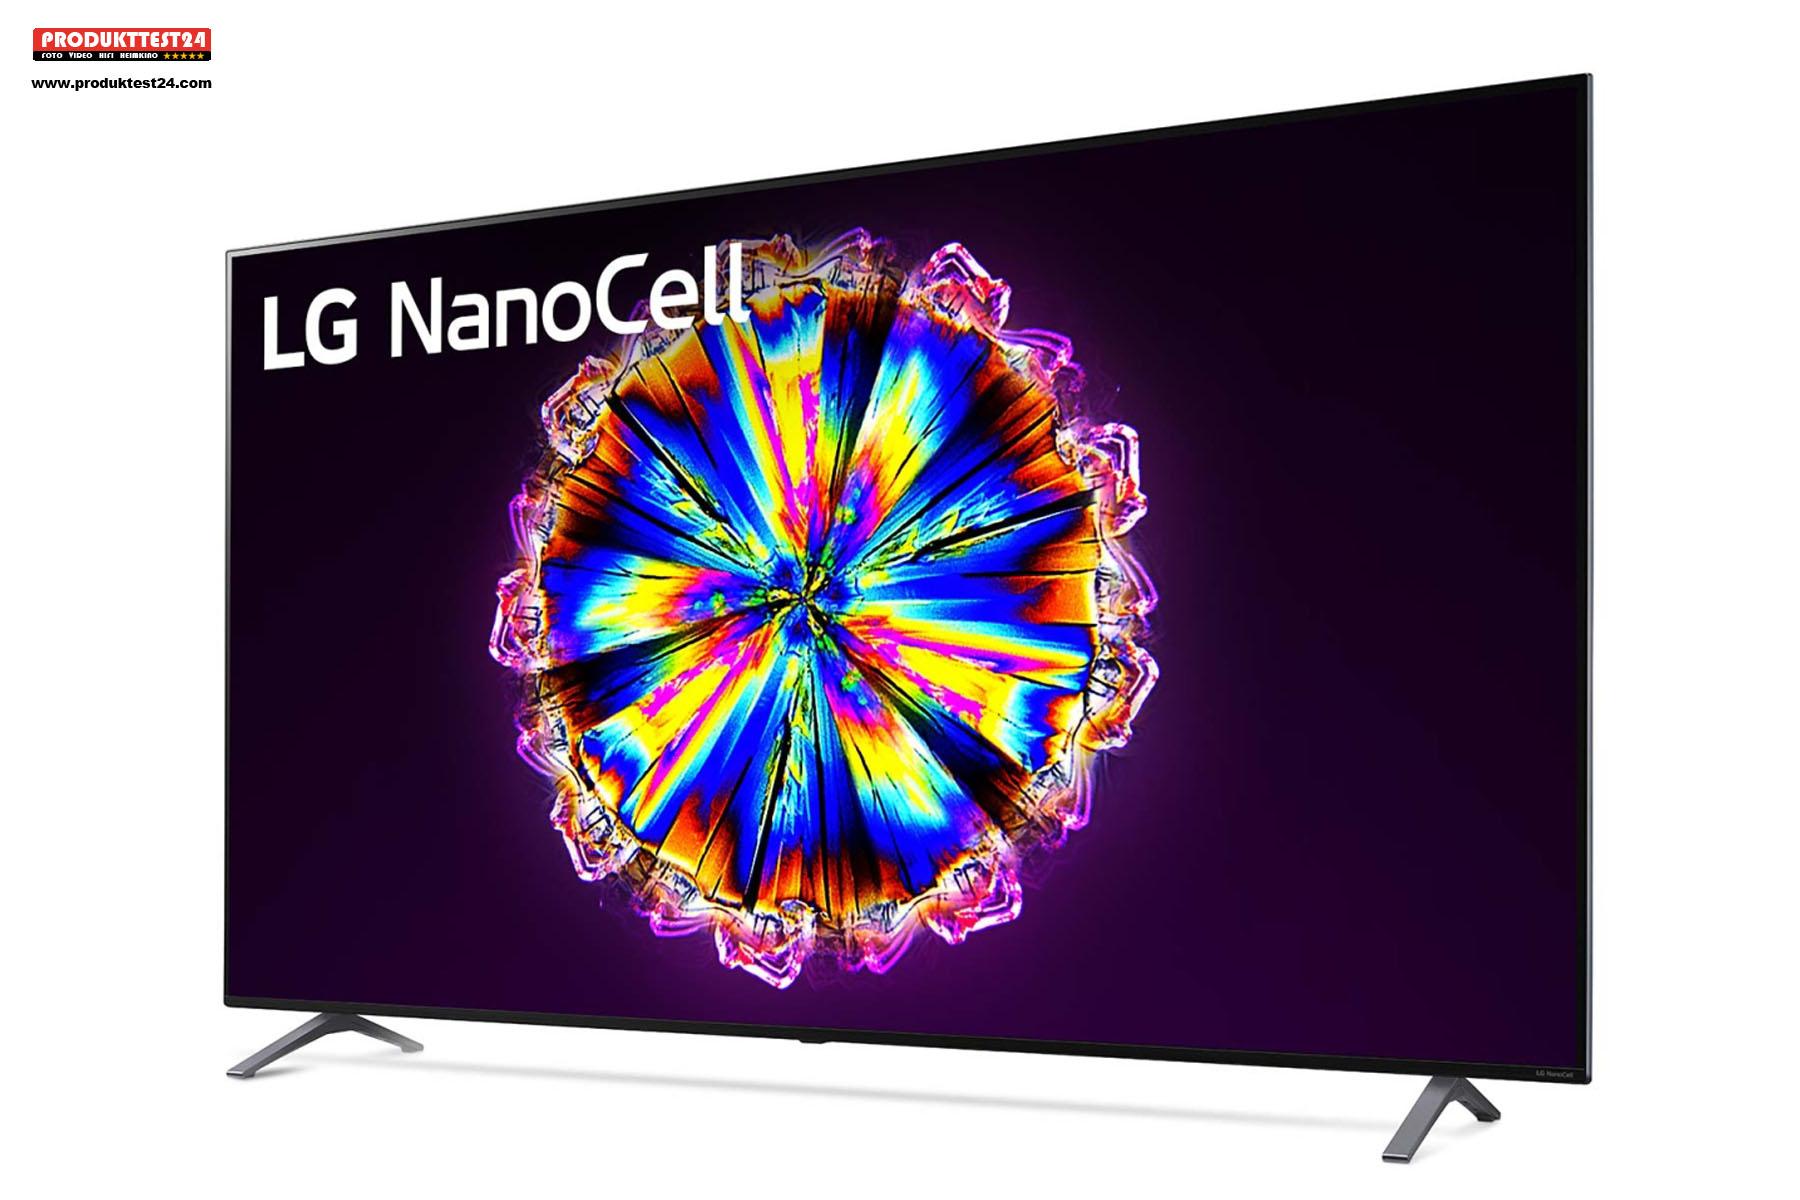 LG 75NANO906NA mit 189 cm Bilddiagonale und 4K-Auflösung.